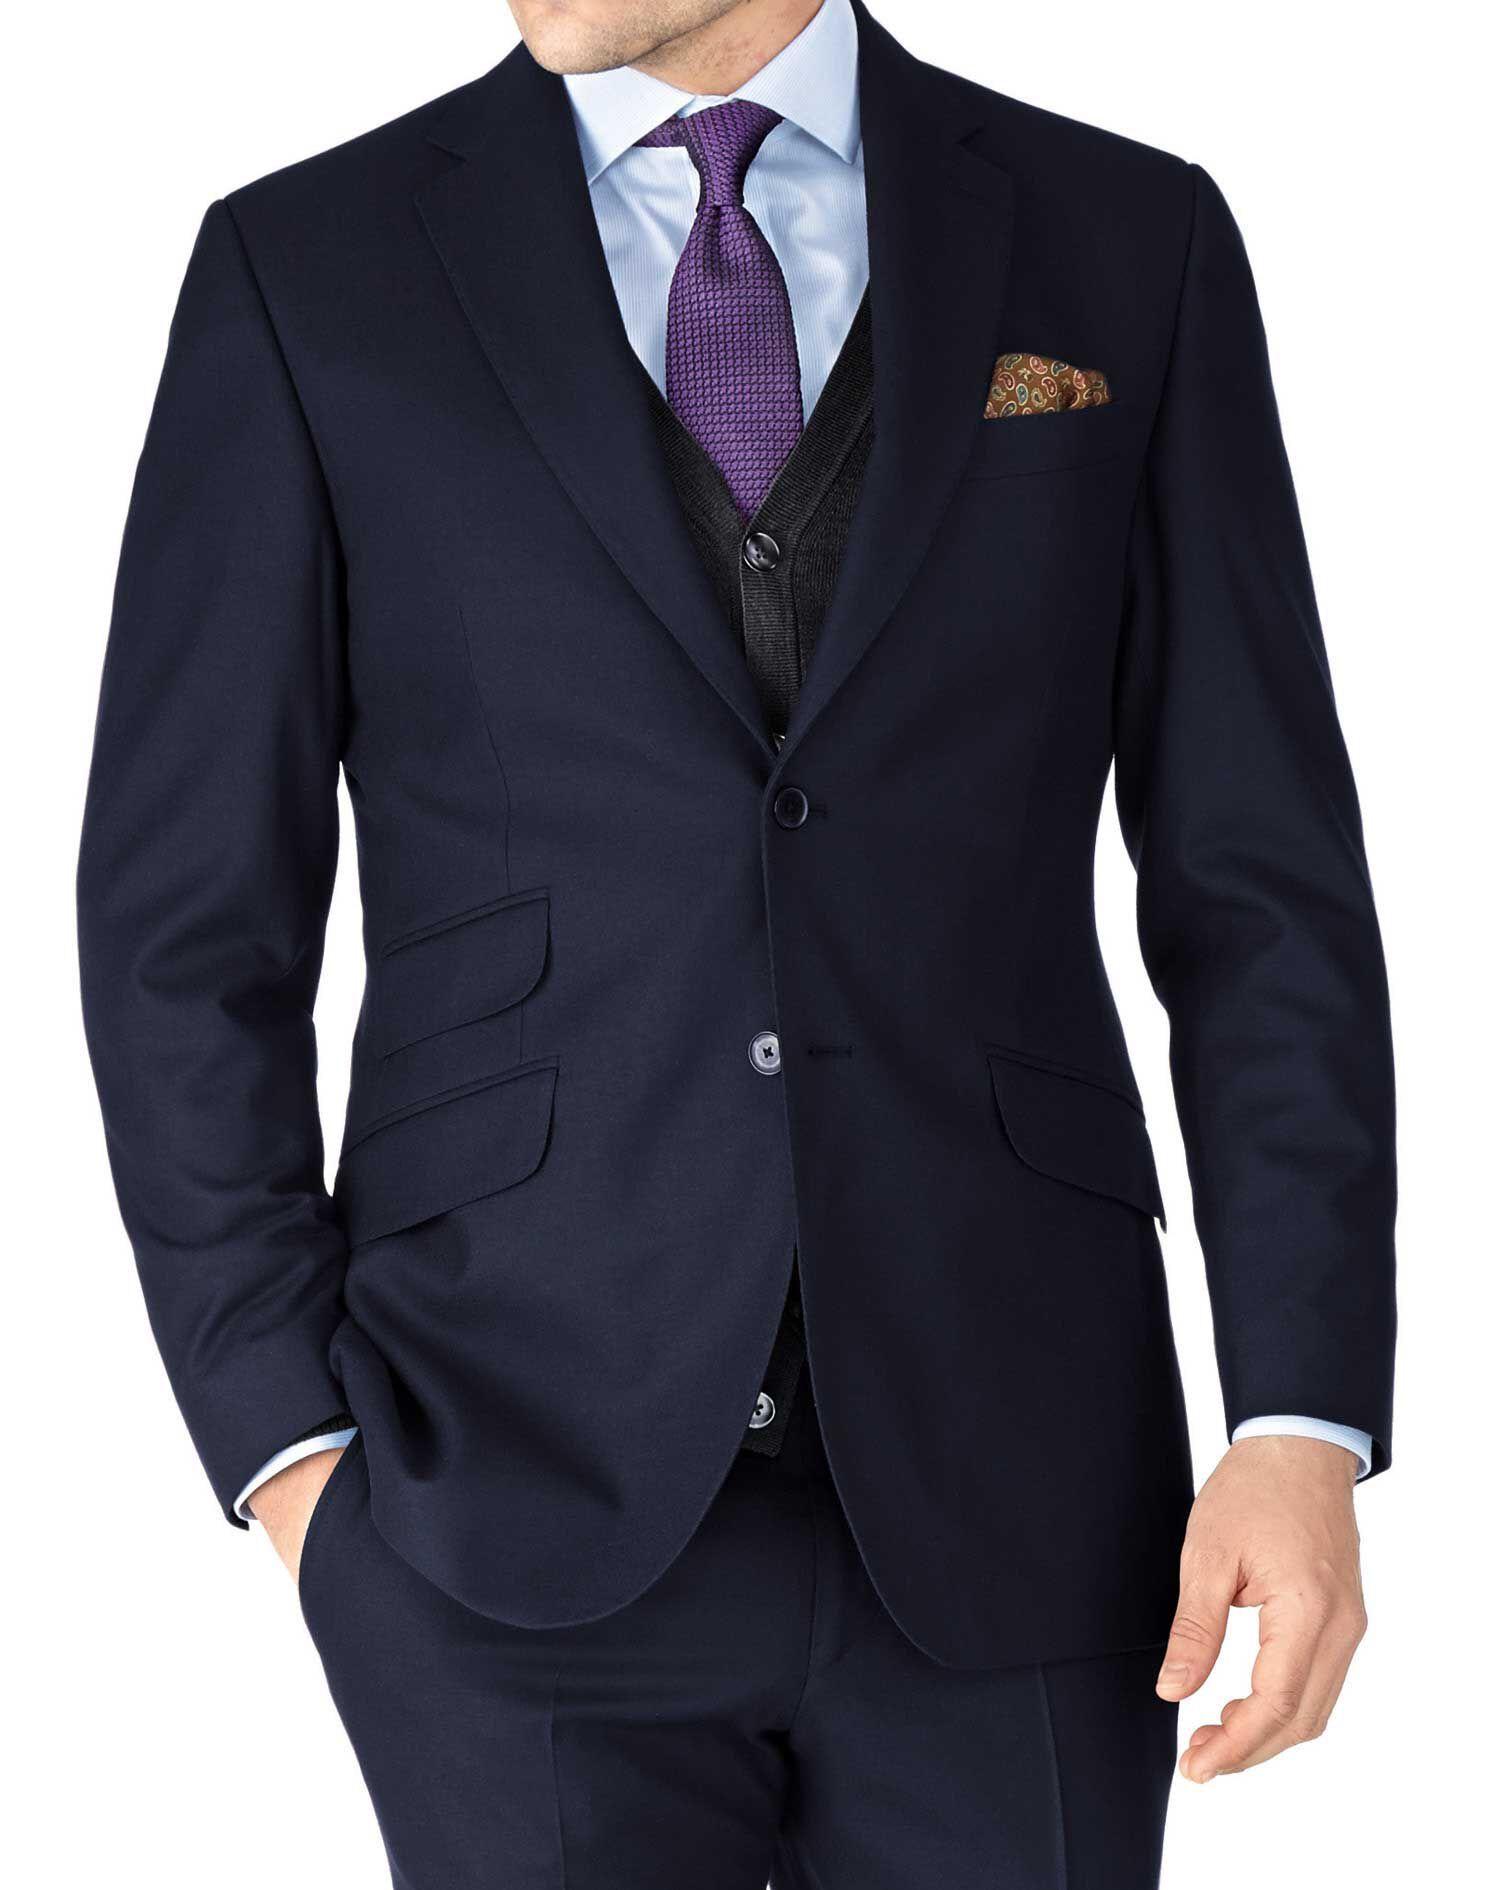 Navy Slim Fit British Serge Luxury Suit Wool Jacket Size 44 Long by Charles Tyrwhitt